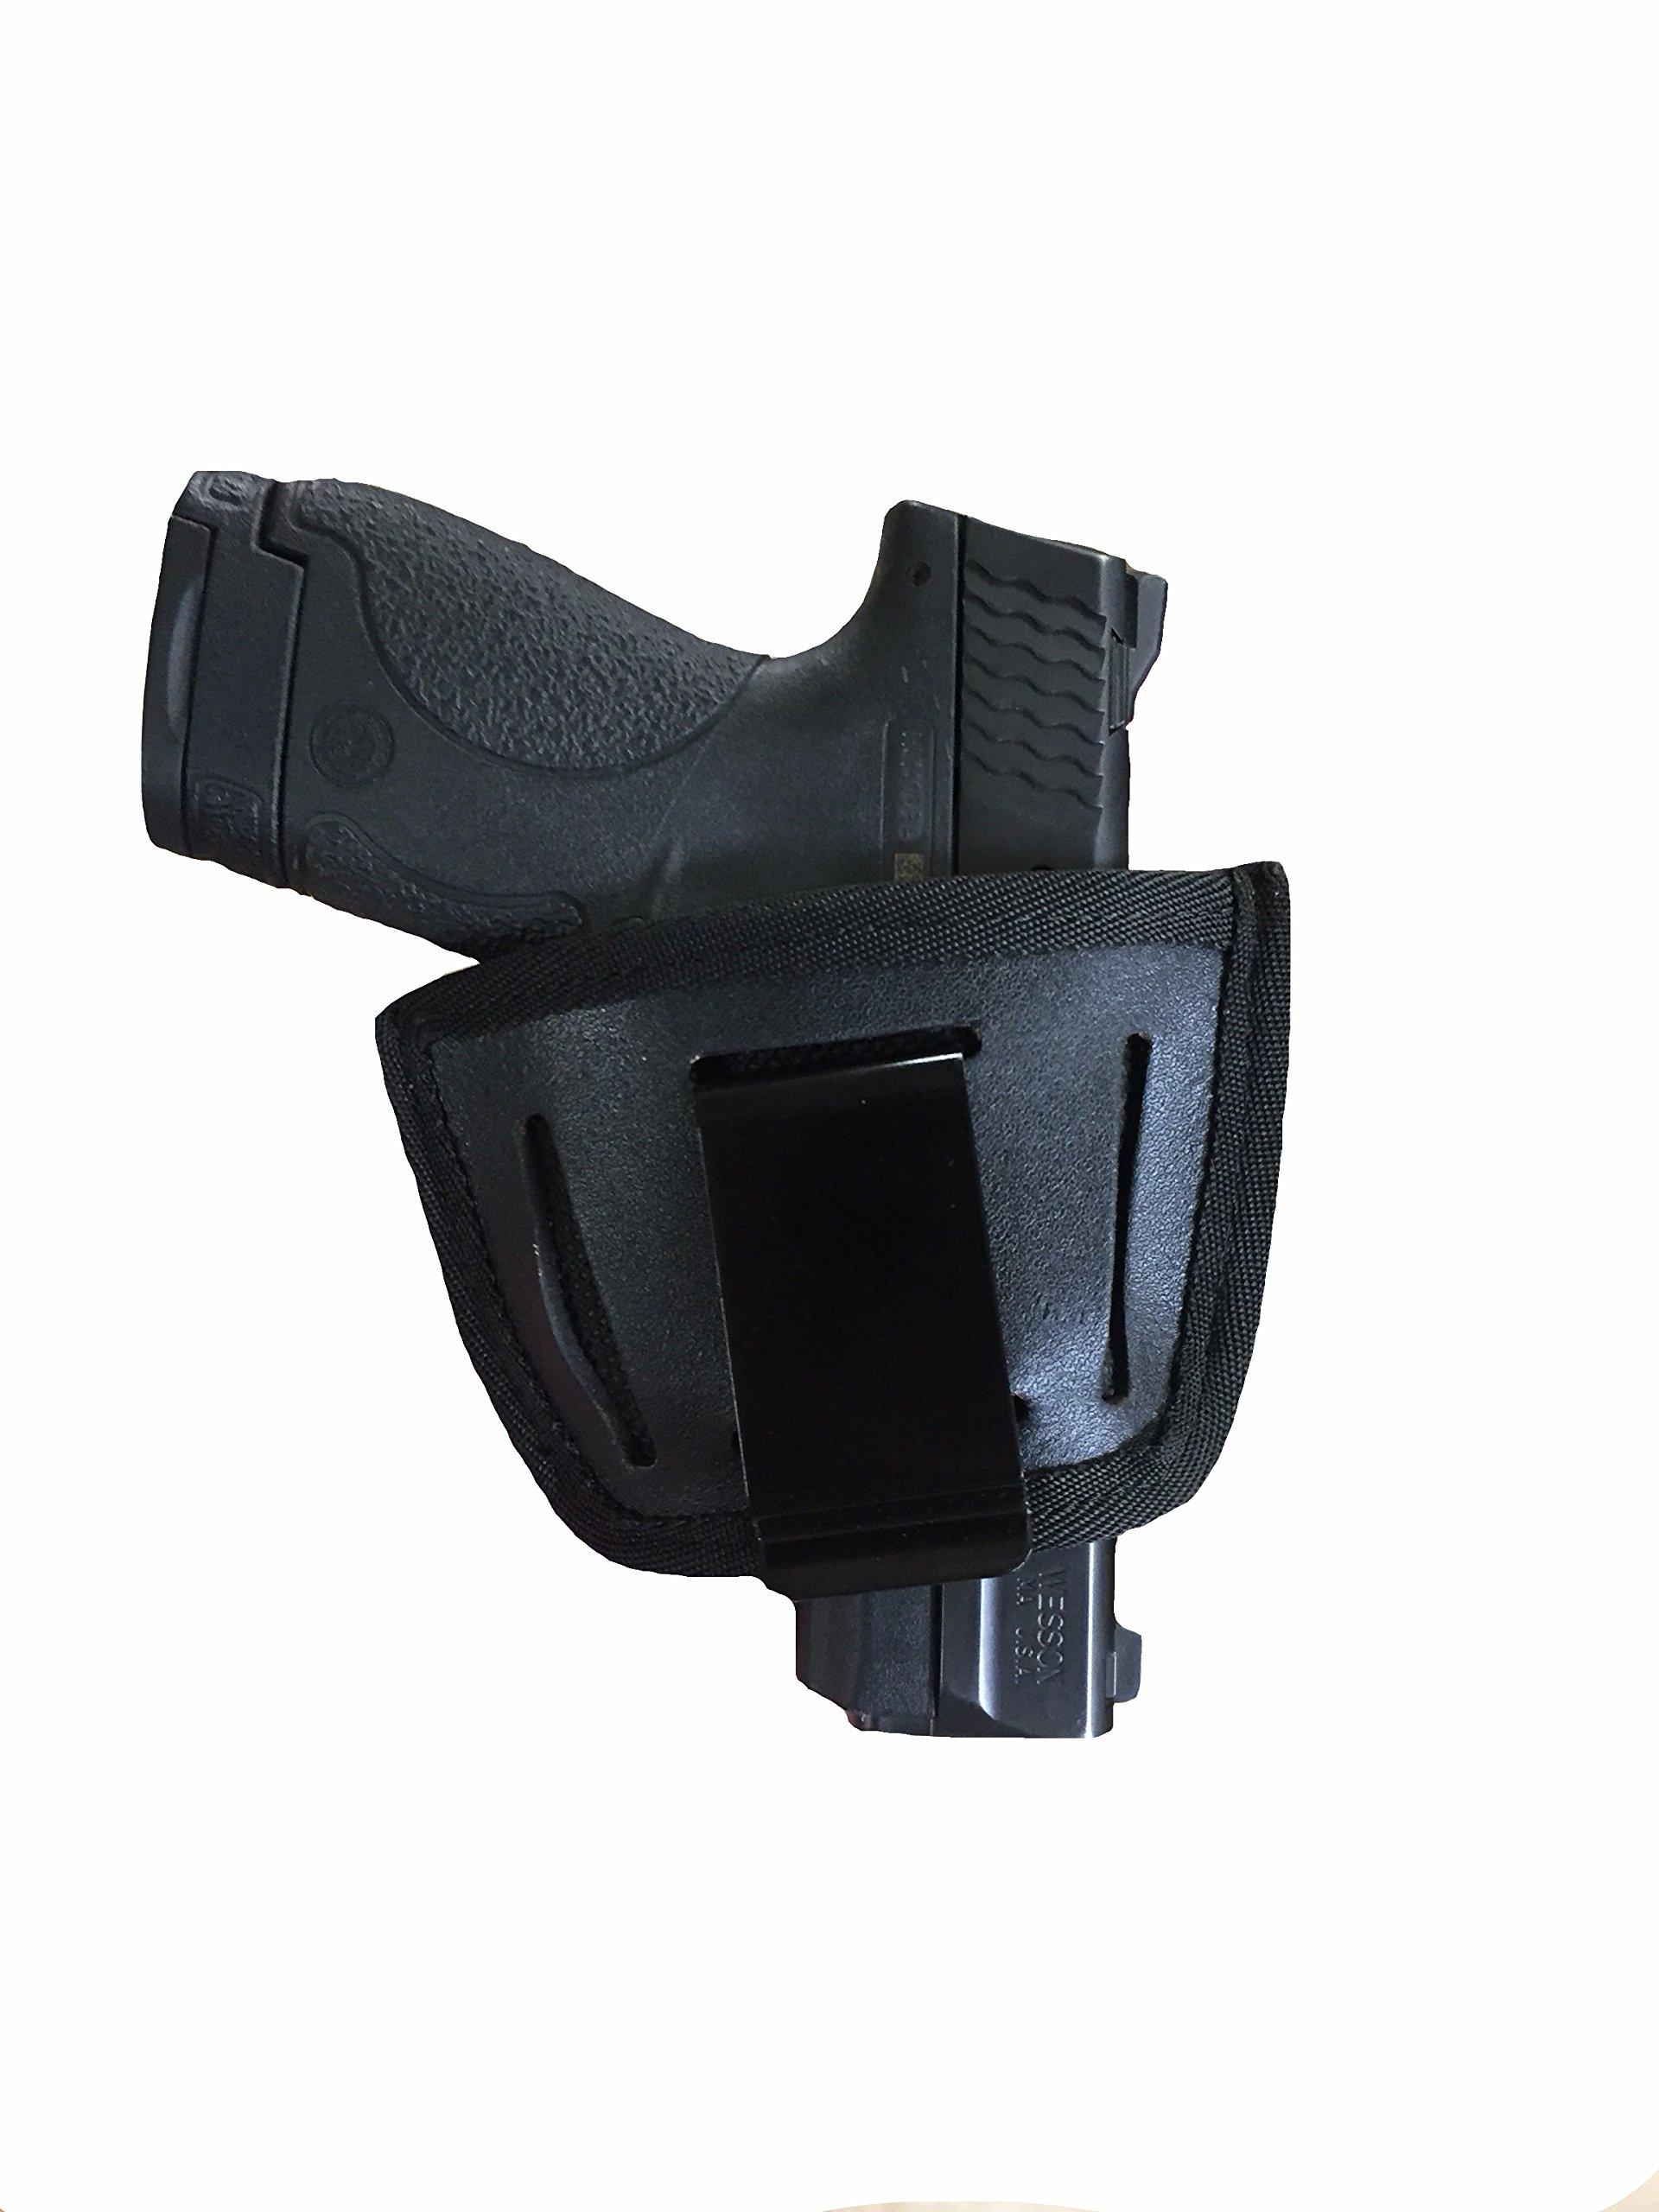 Beretta Vertec 9mm, M9 Concealed Inside The Pants Leather Gun Holster.